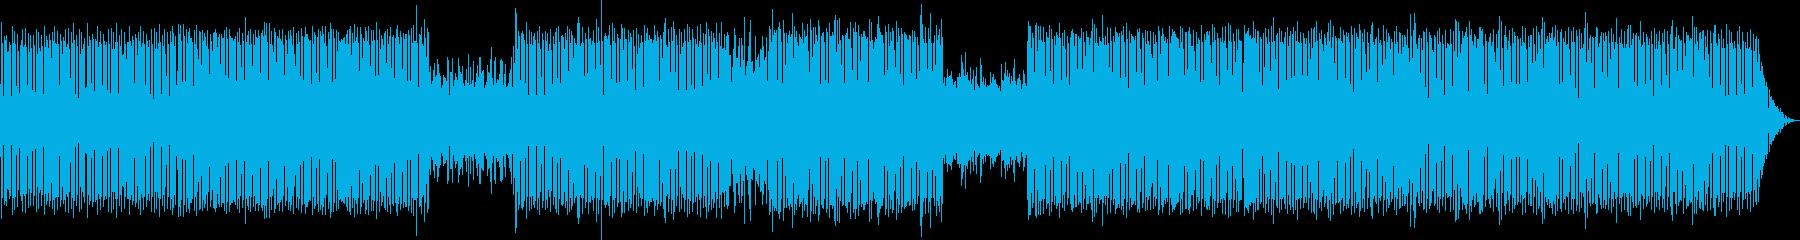 minimal technoの再生済みの波形